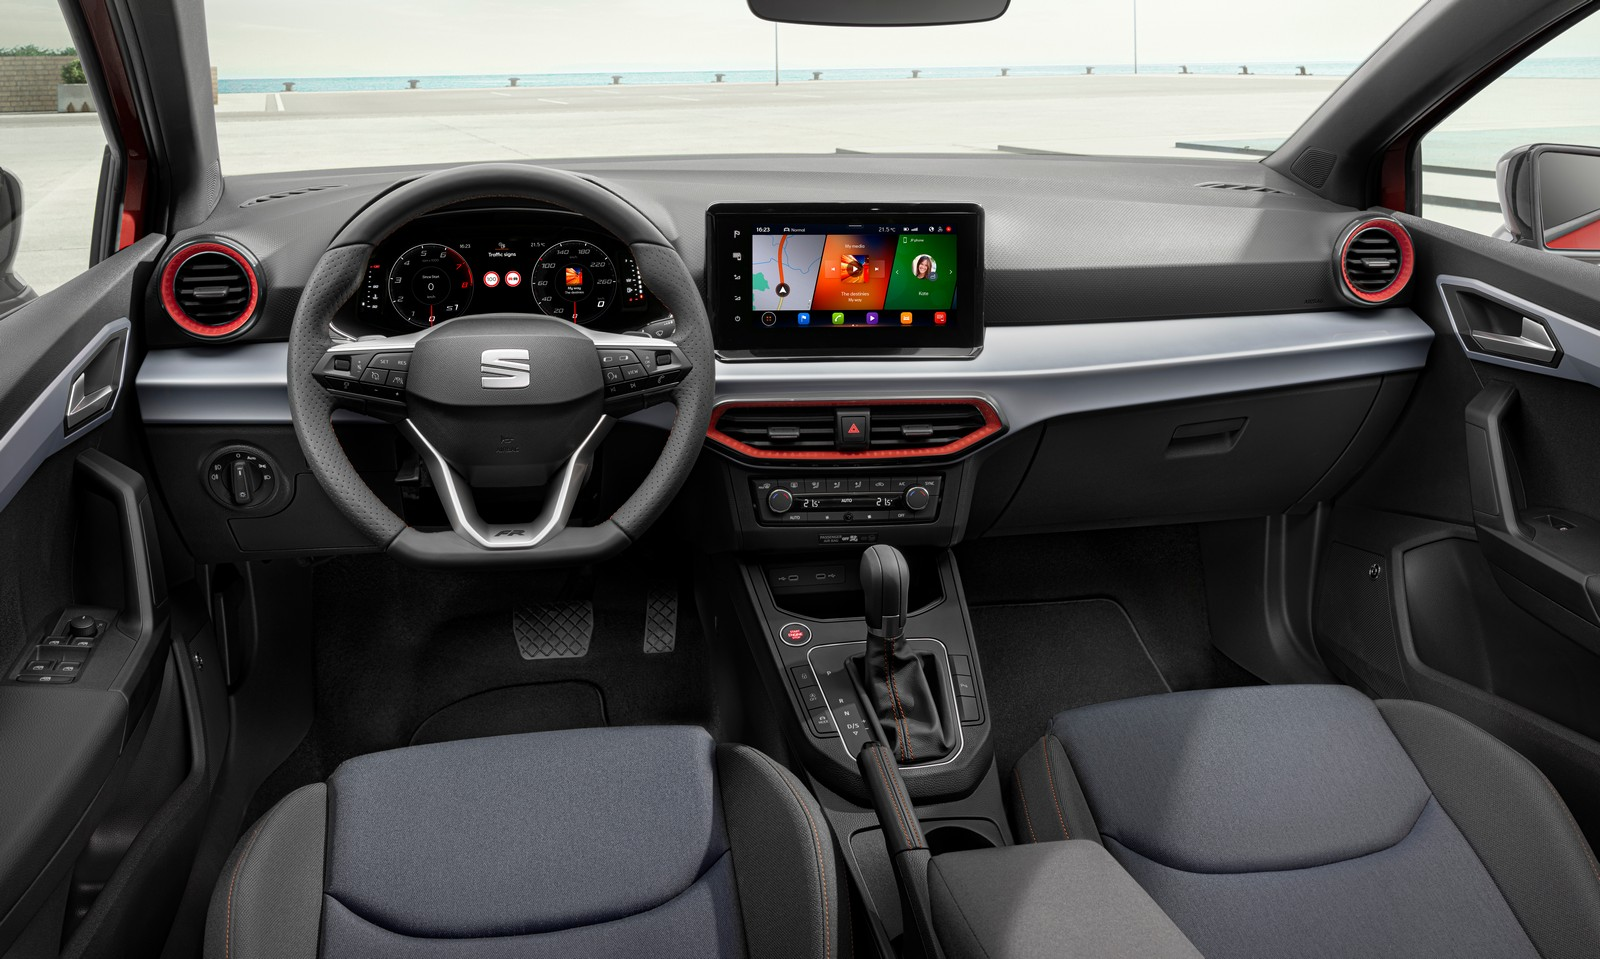 Seat Ibiza Facelift 11